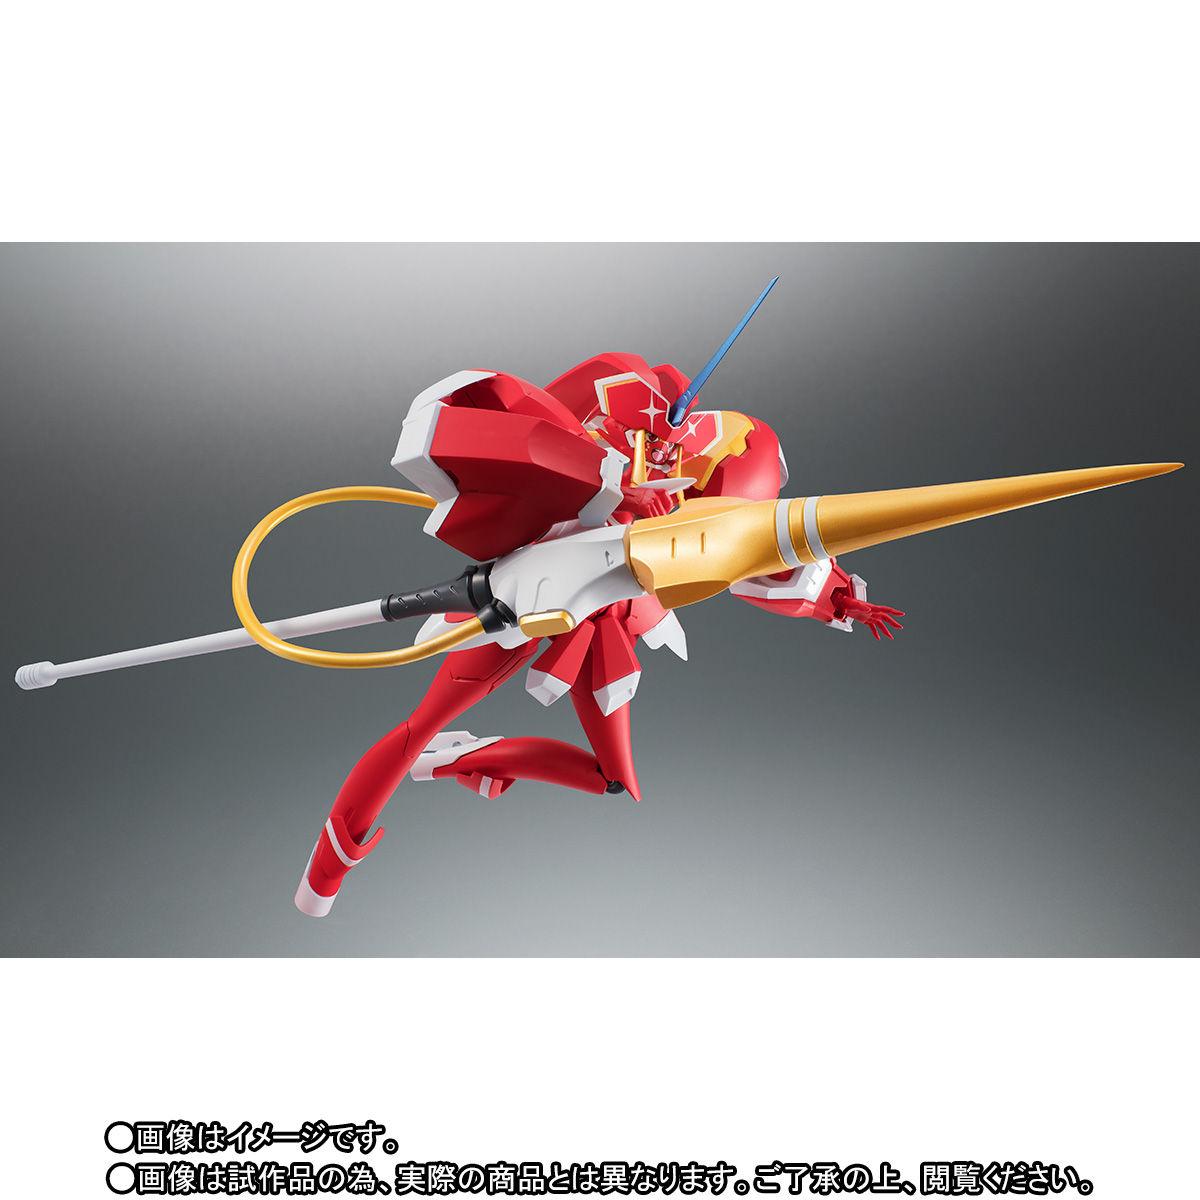 ROBOT魂〈SIDE FRANXX〉『ストレリチア・XX(キス)』ダーリン・イン・ザ・フランキス 可動フィギュア-005